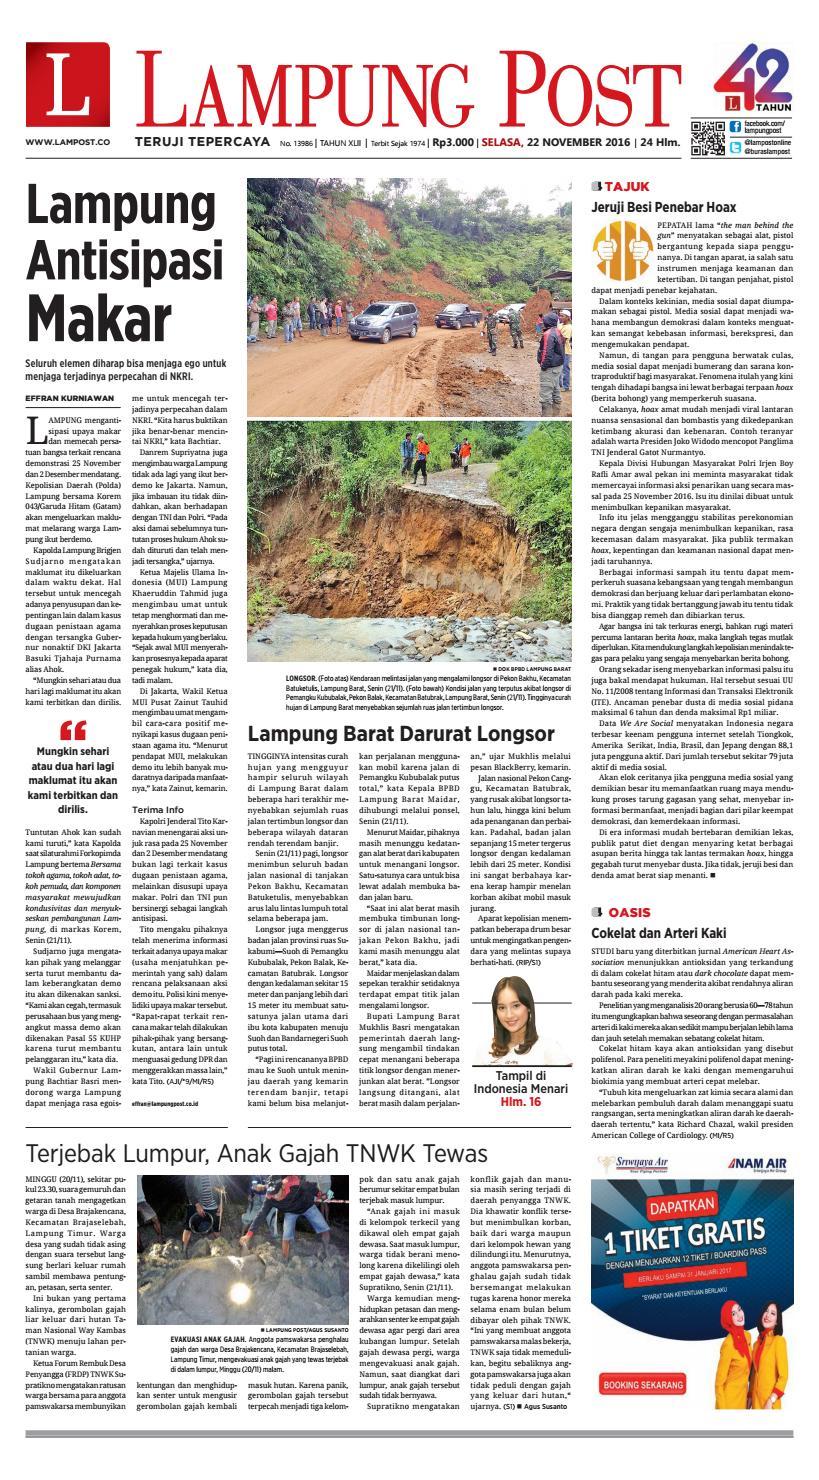 Lampung Post Selasa 22 November 2016 By Issuu Produk Umkm Bumn Kapal Batok Lebak